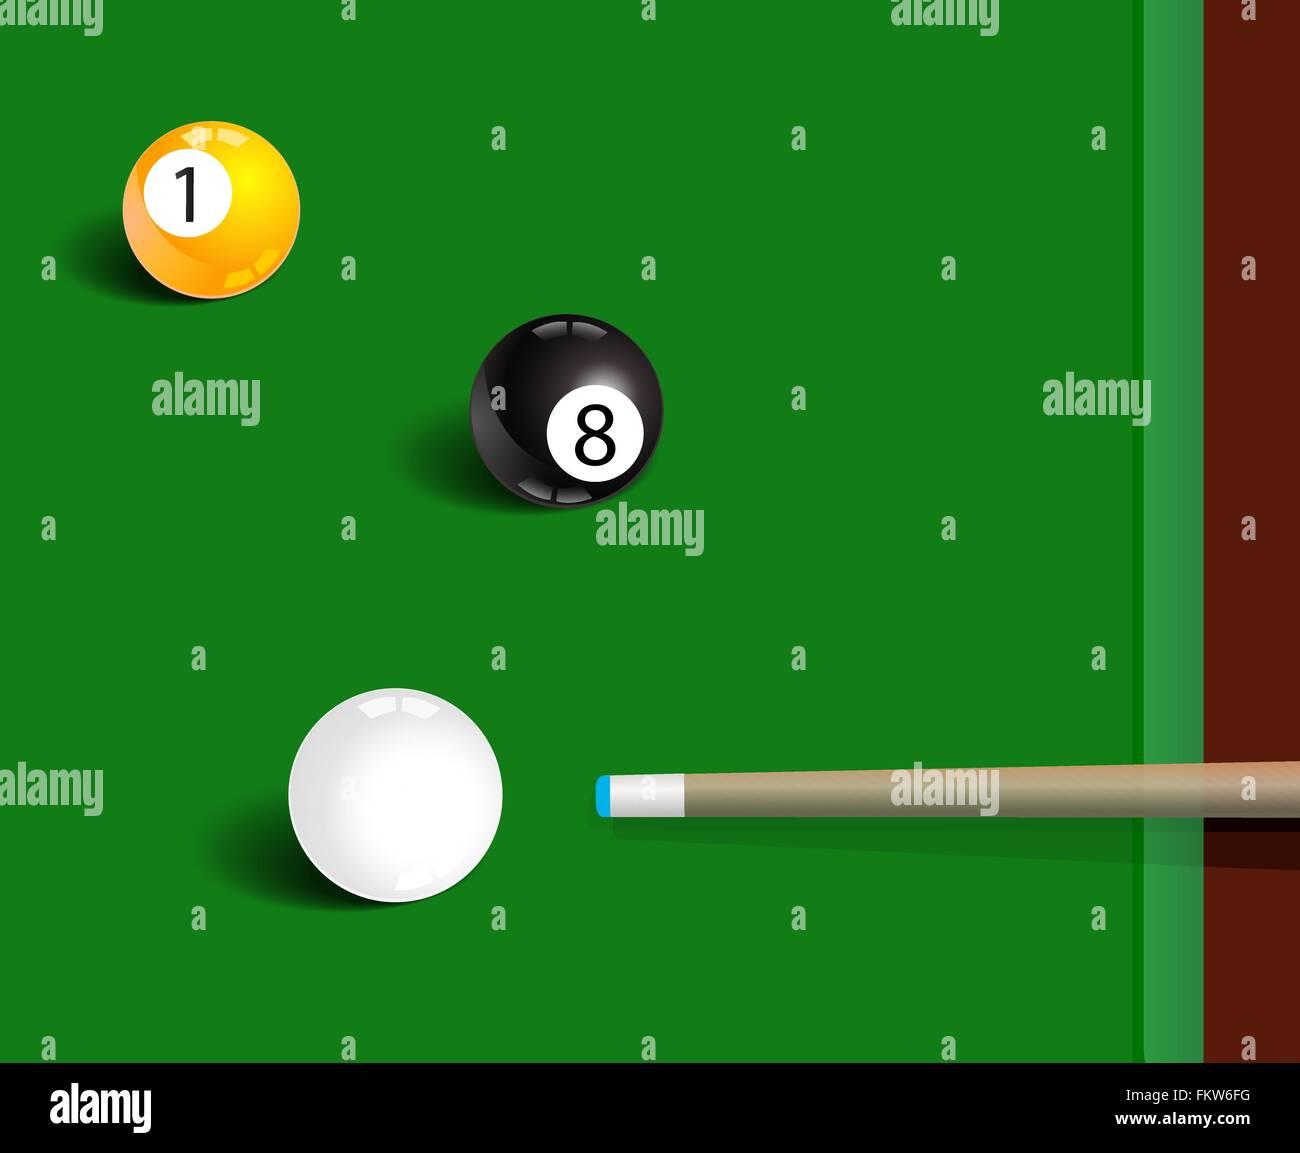 Billiards sport game background - Stock Vector